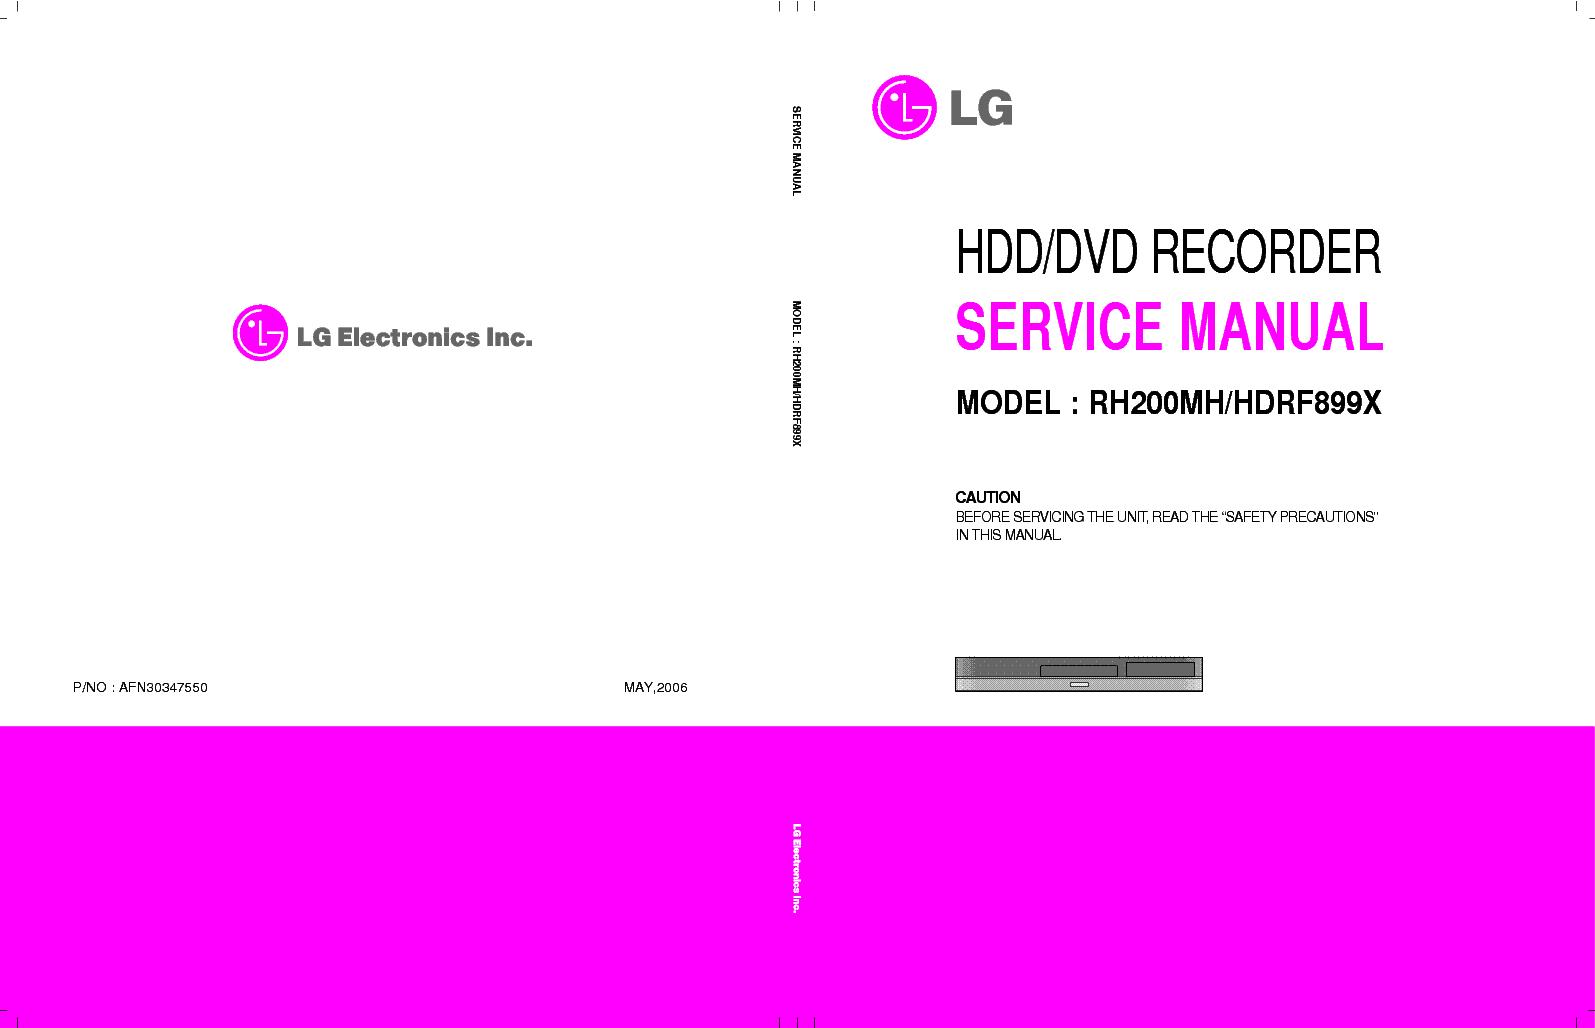 Lg rc388 service manual.